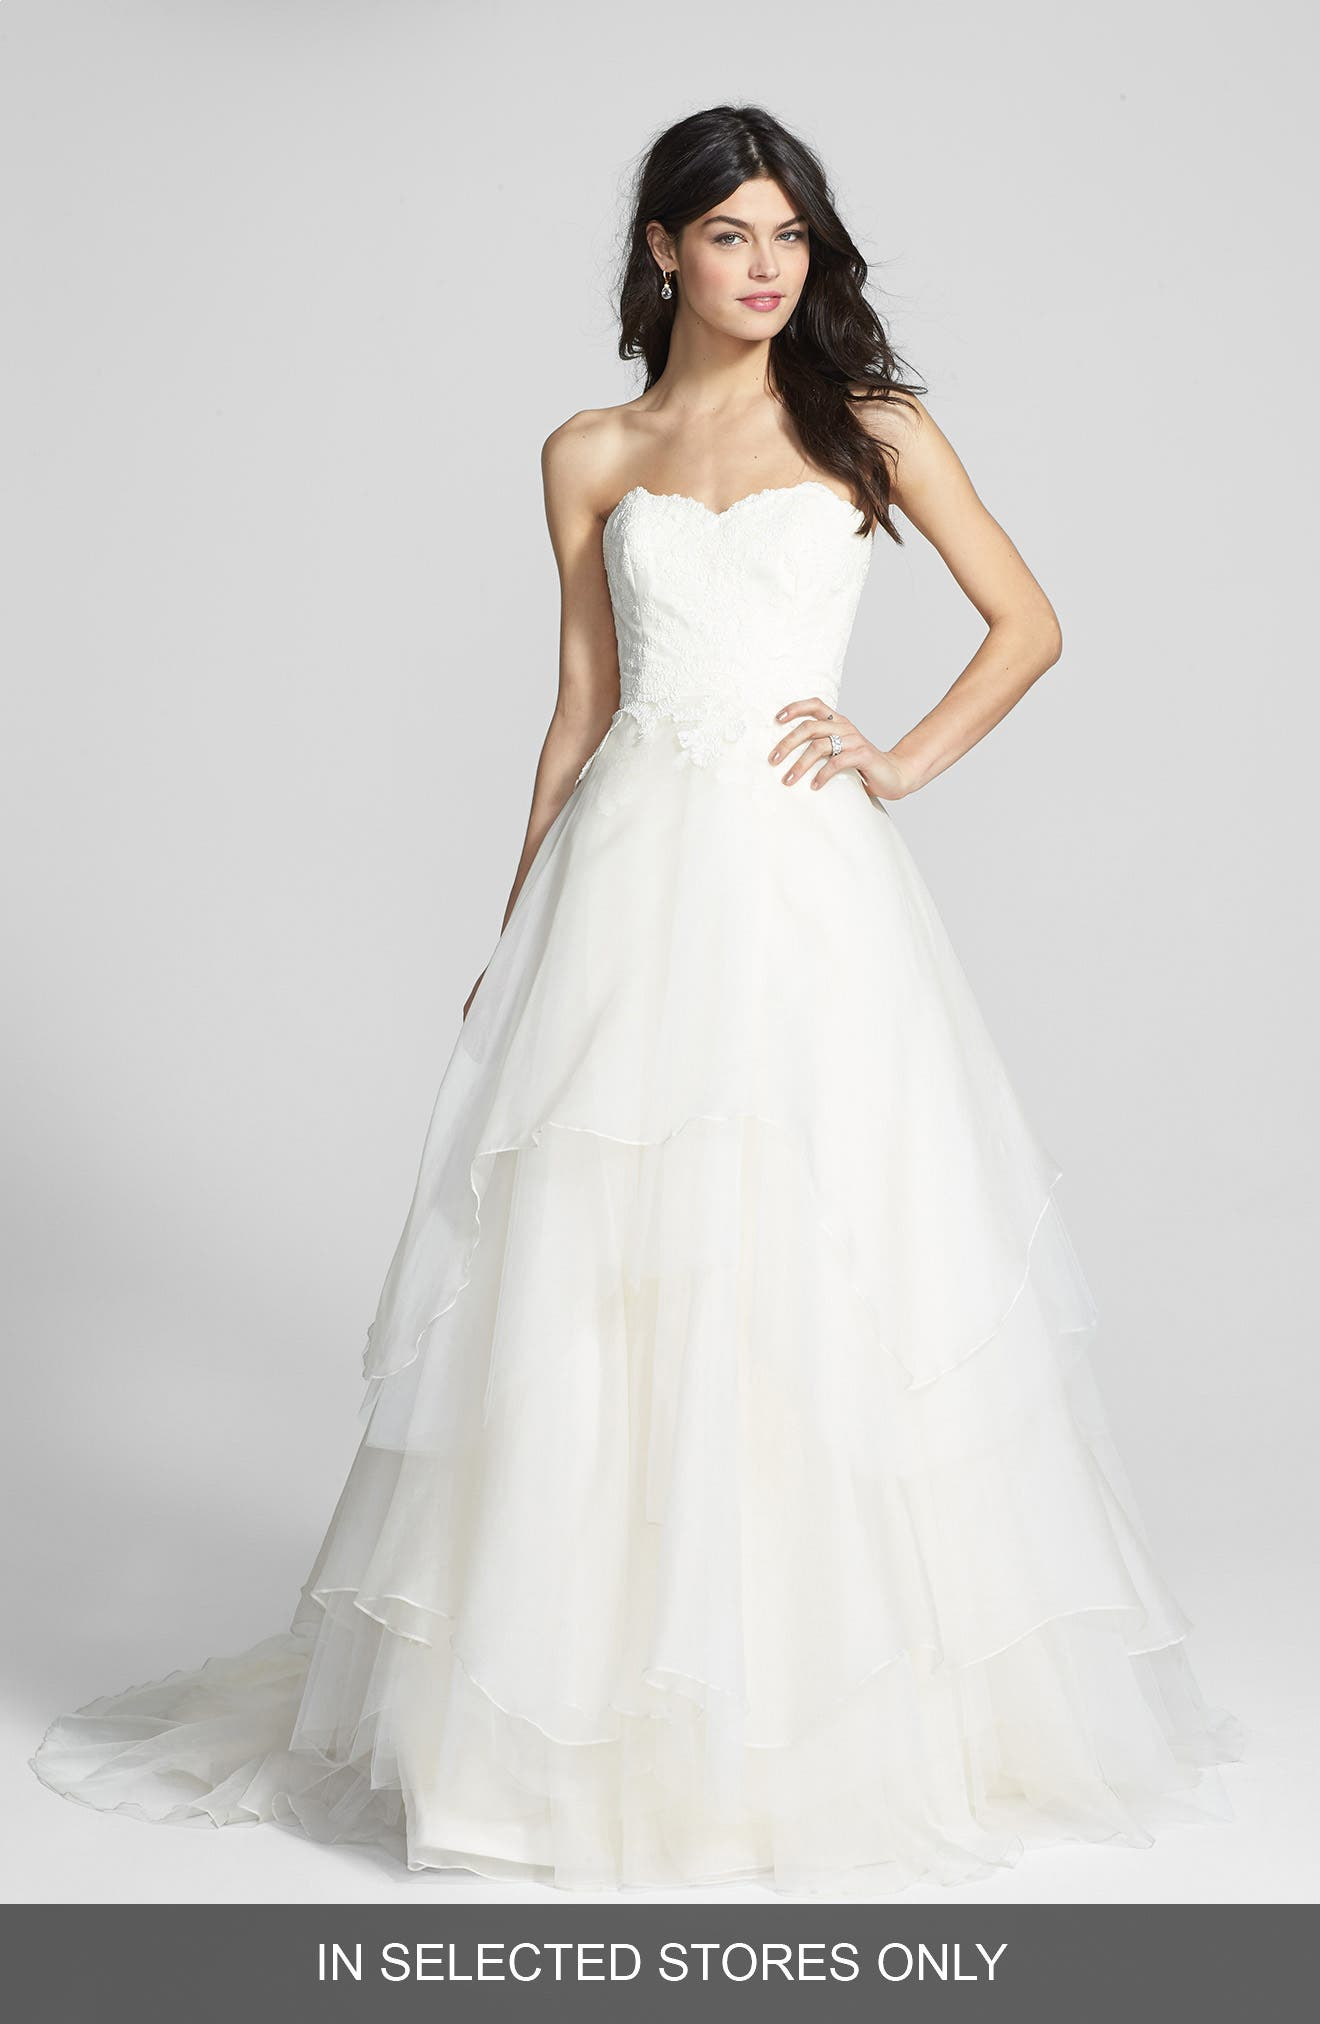 Hayley Paige 'Mila' Strapless Silk Organza Wedding Dress (In Stores Only)